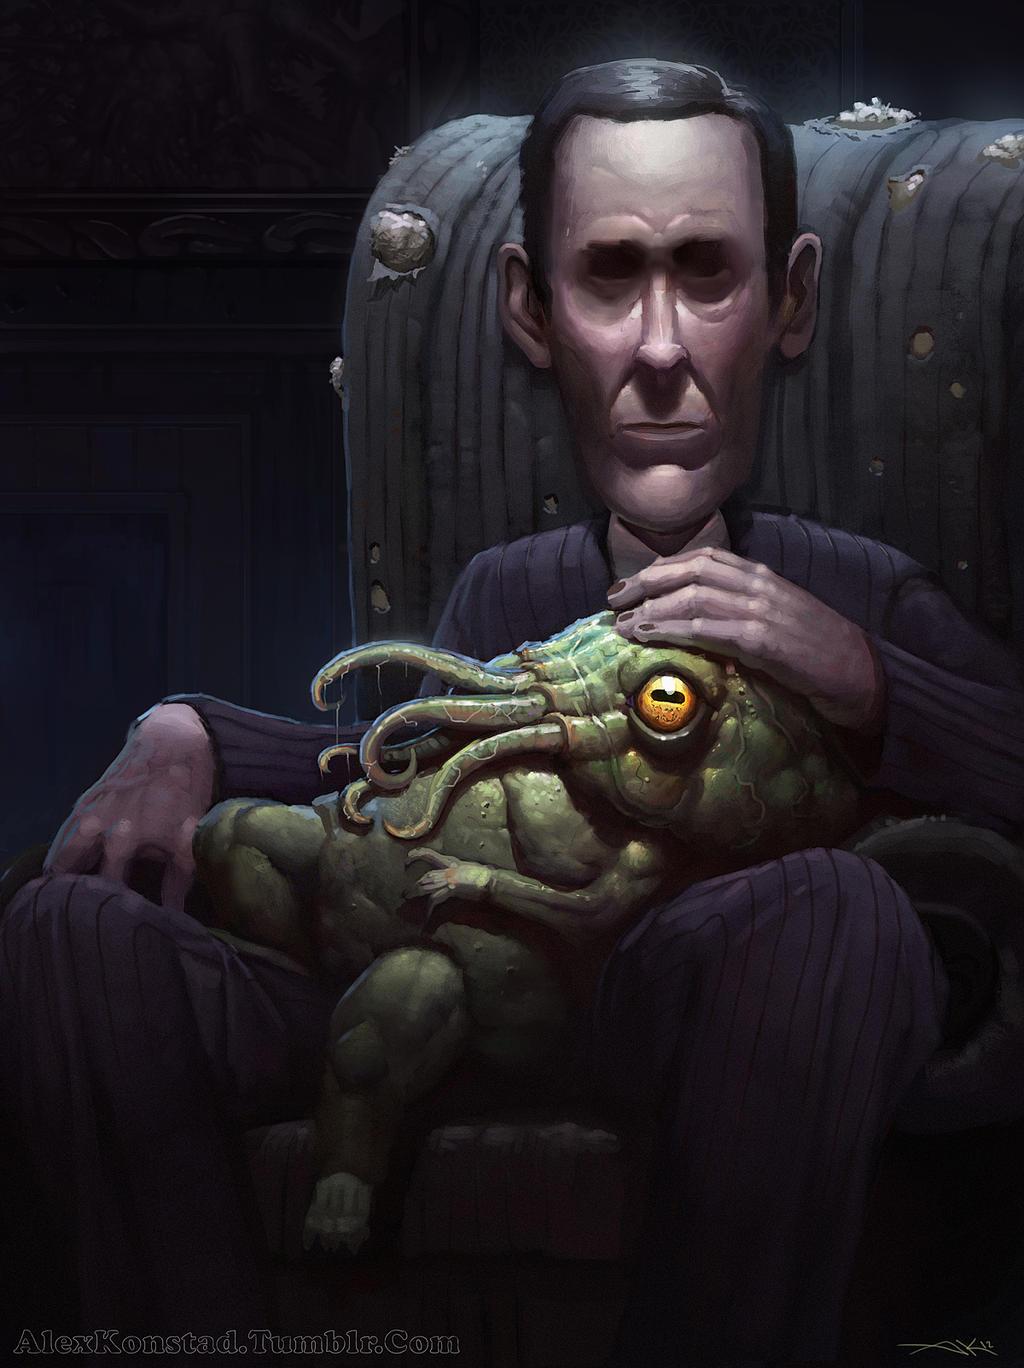 Like Father Like Son: A Portrait of HP Lovecraft by AlexKonstad